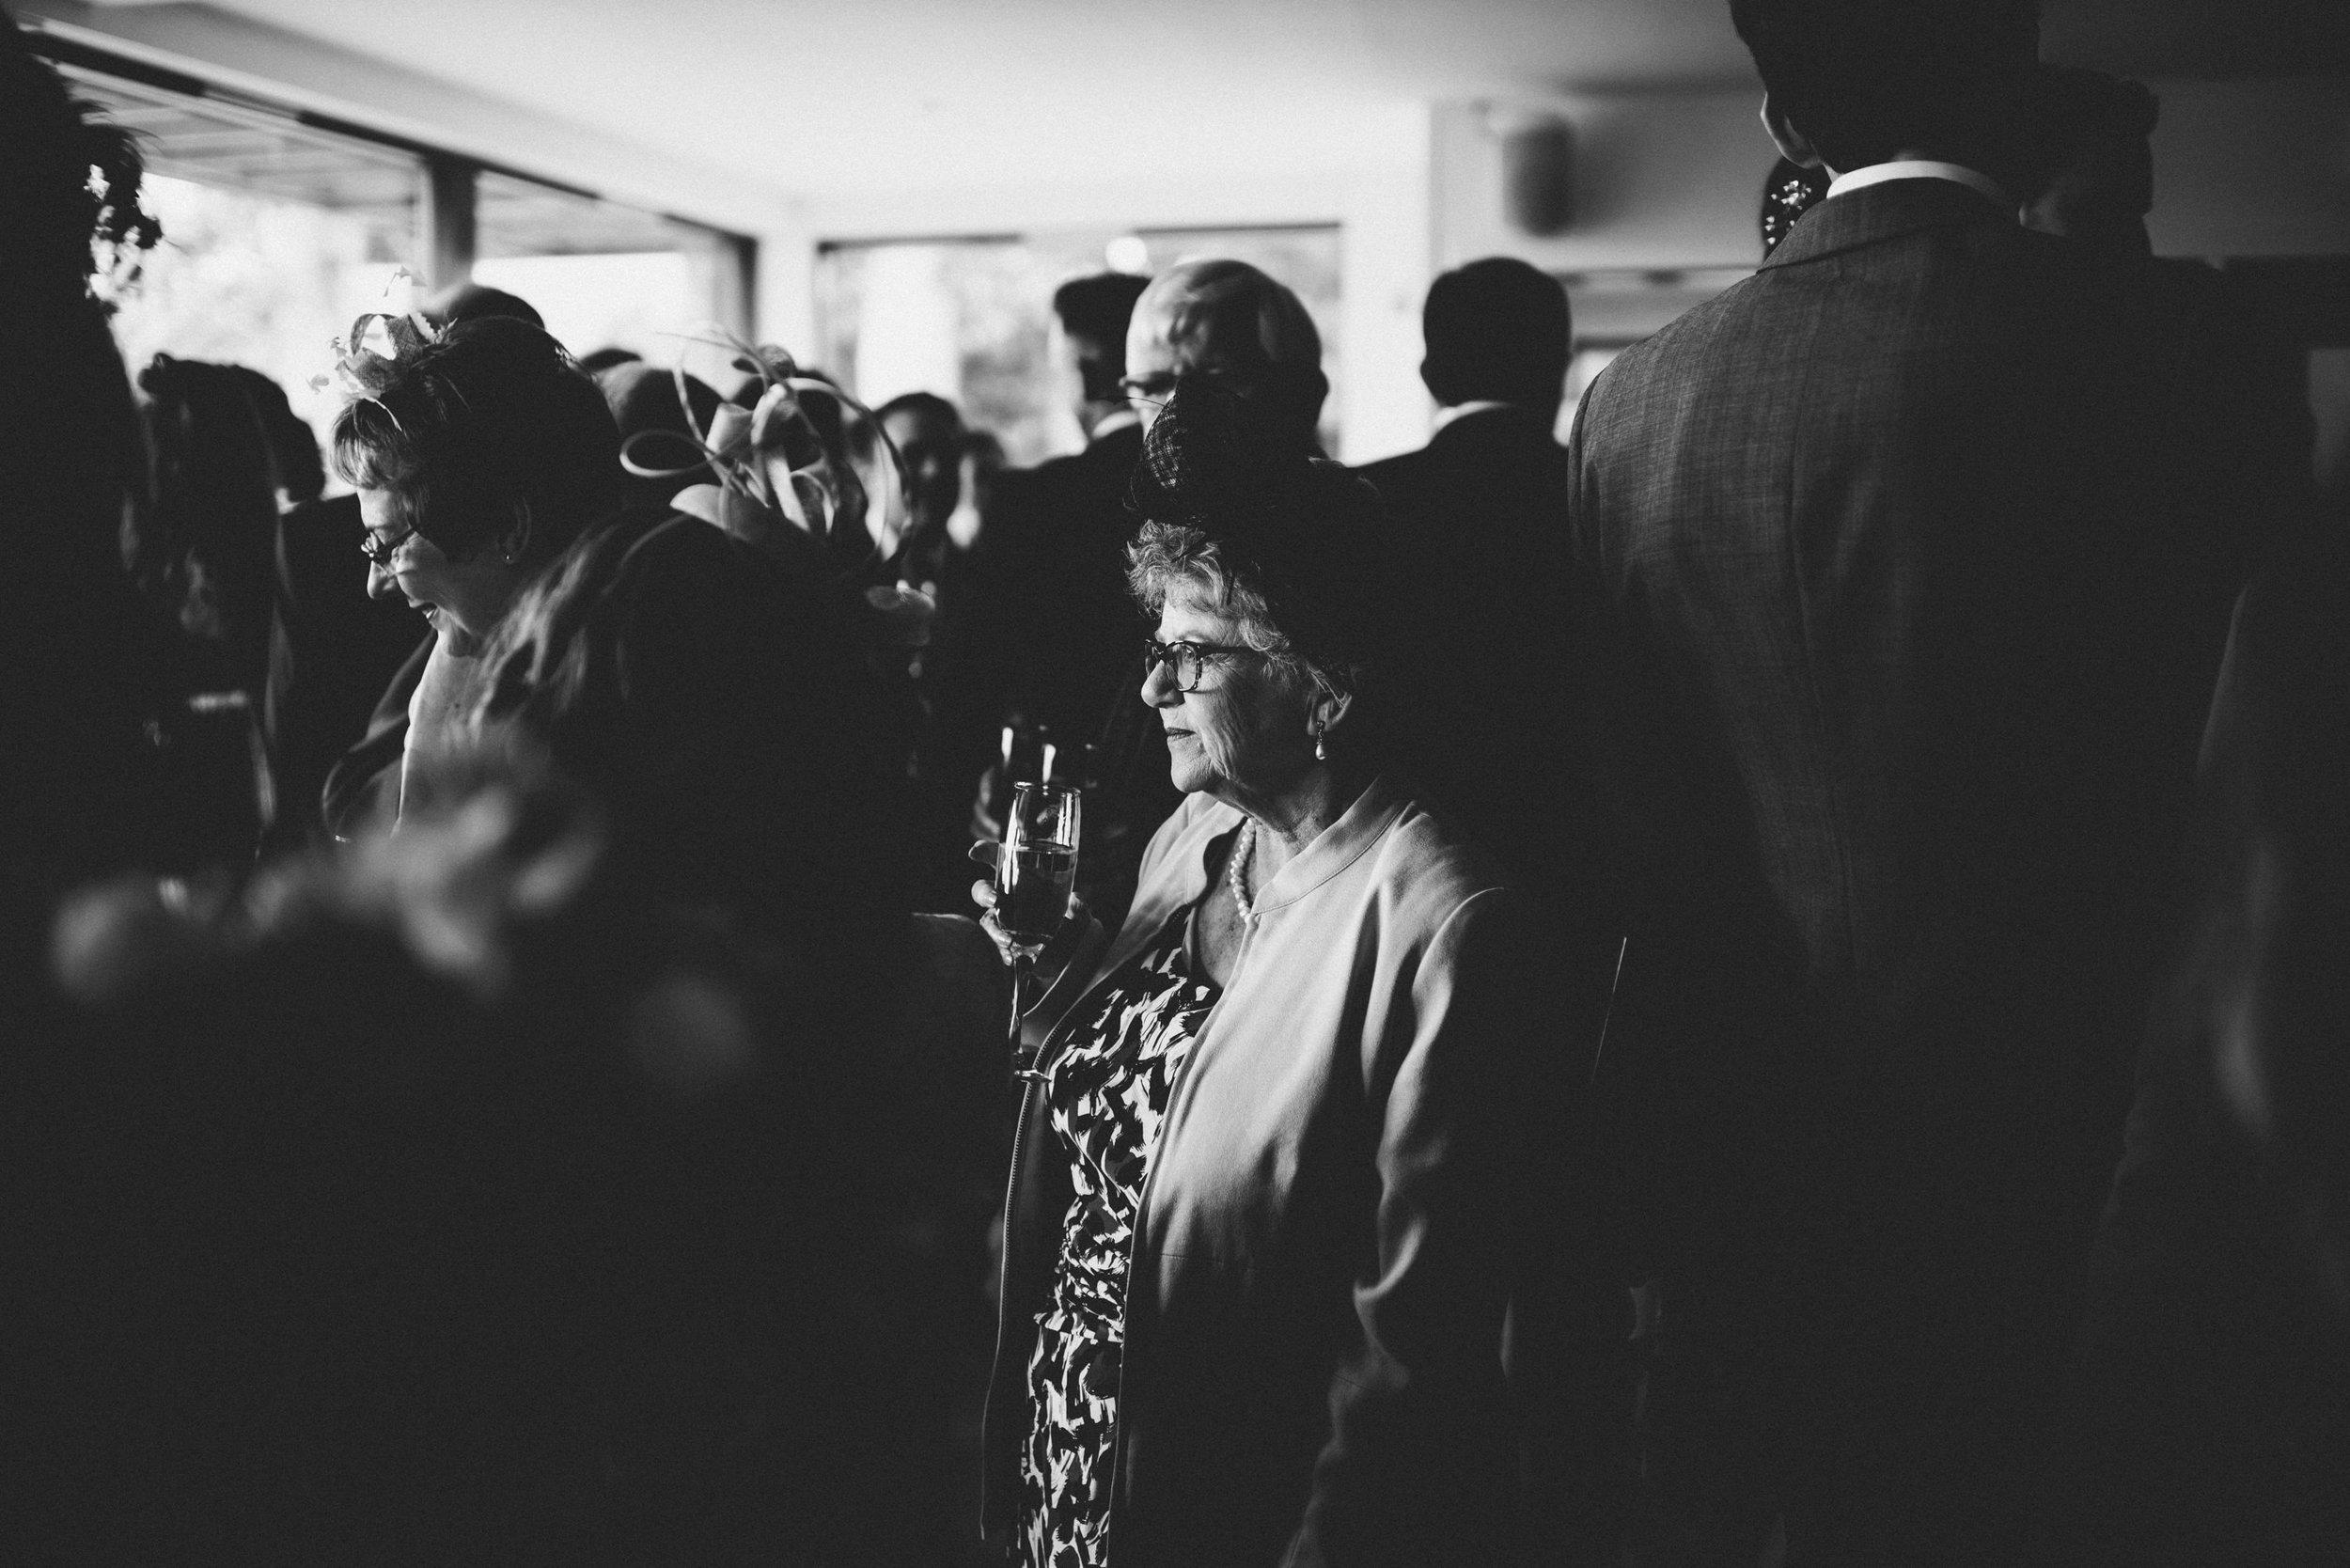 0031-LISA-DEVINE-PHOTOGRAPHY-ALTERNATIVE-WEDDING-PHOTOGRAPHY-SCOTLAND-DESTINATION-WEDDINGS-GLASGOW-WEDDINGS-COOL-WEDDINGS-STYLISH-WEDDINGS.JPG